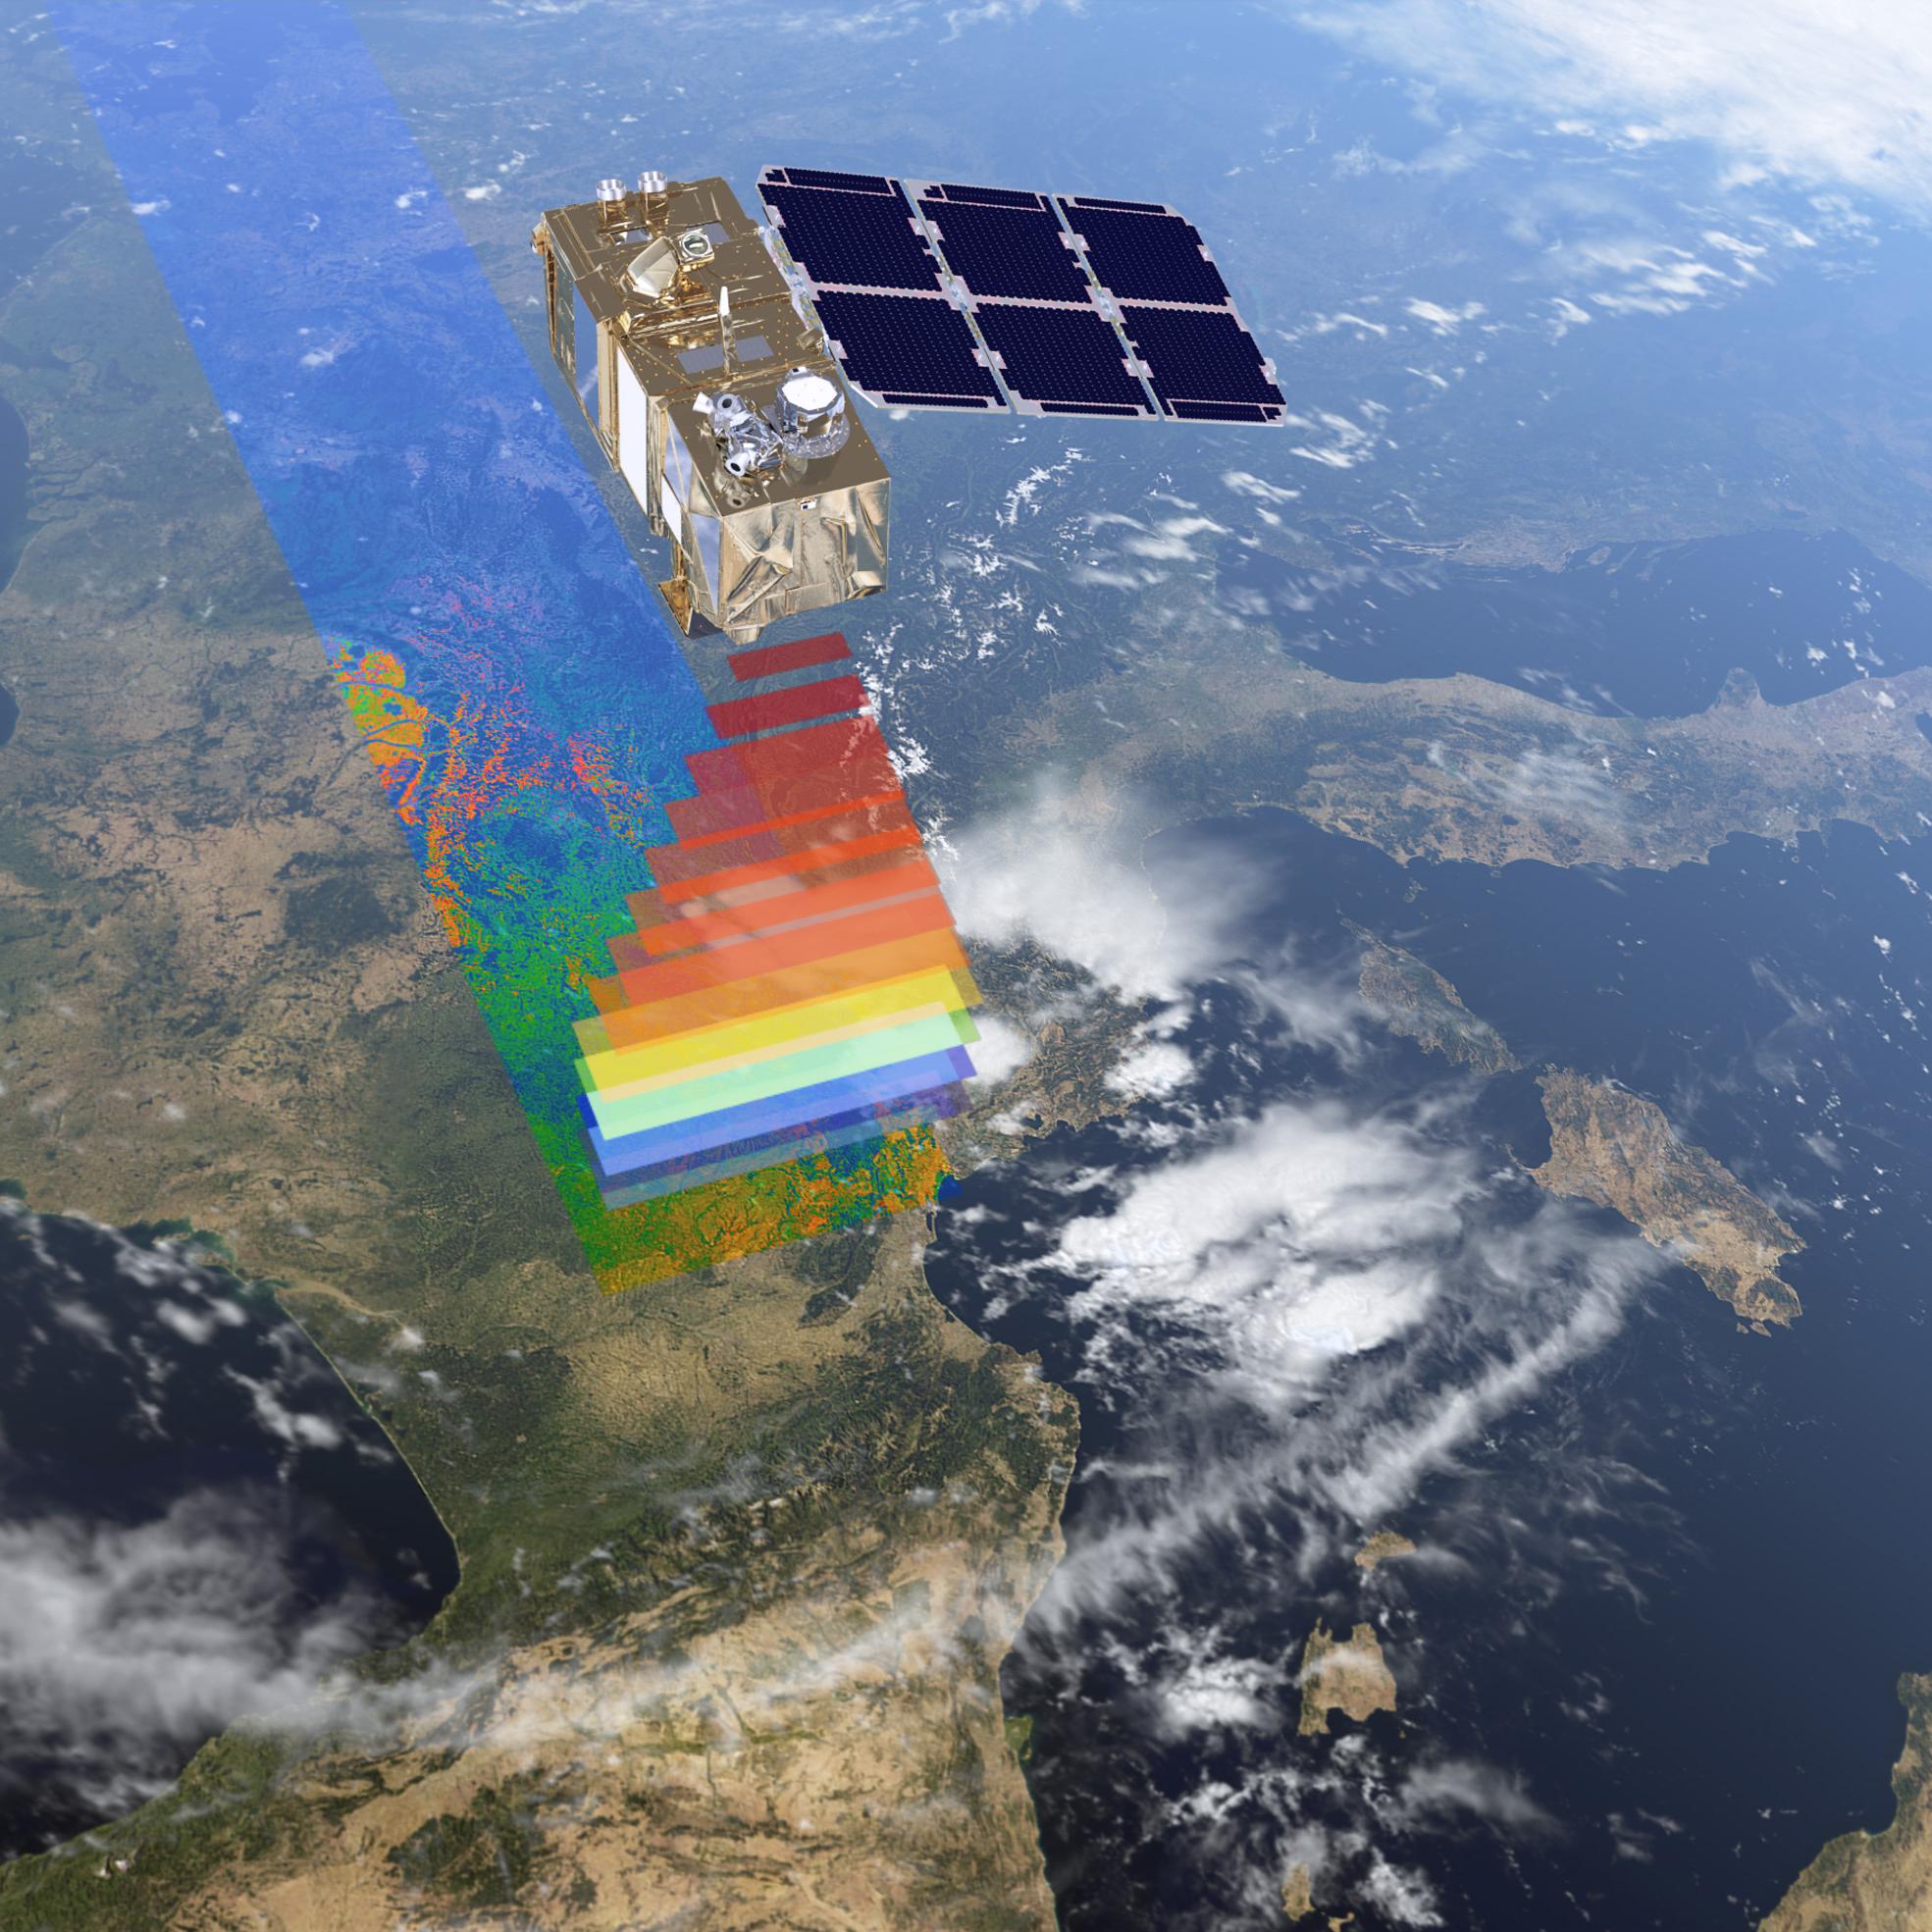 Buzzard Drone multispectral camera is compatible with the ESA Sentinel2 Satellites